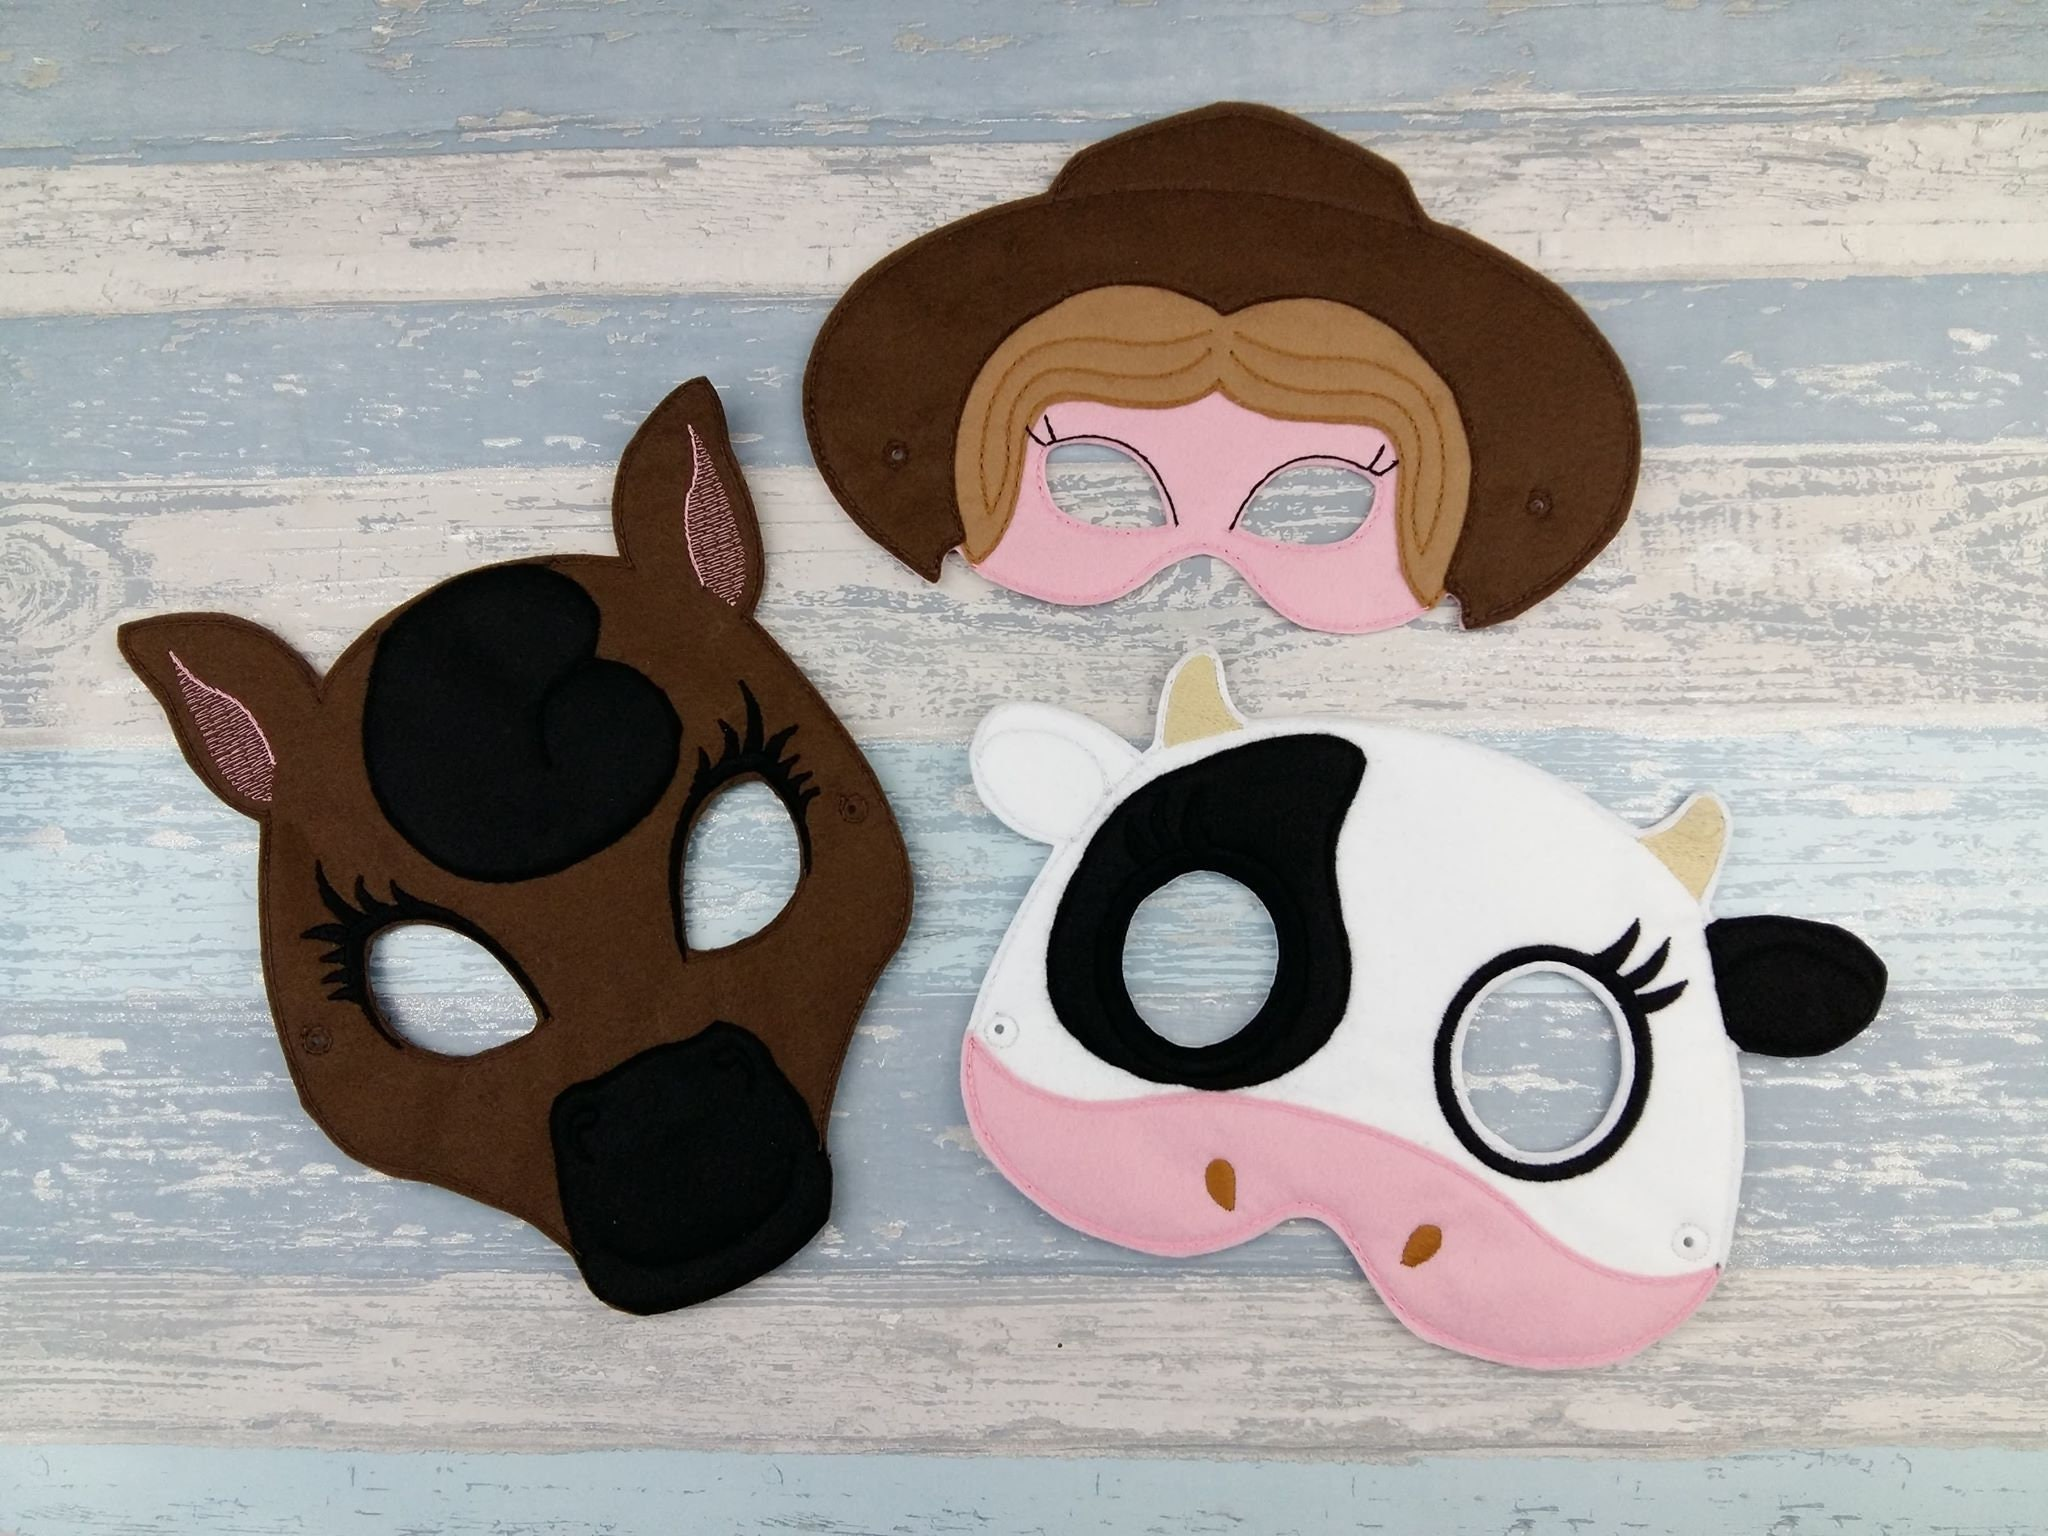 Farm Animal Mask Set Barnyard Felt Mask Old MacDonald Farm Farmer Farm Animal Masks Cow Horse Dog Sheep Halloween Animal Party